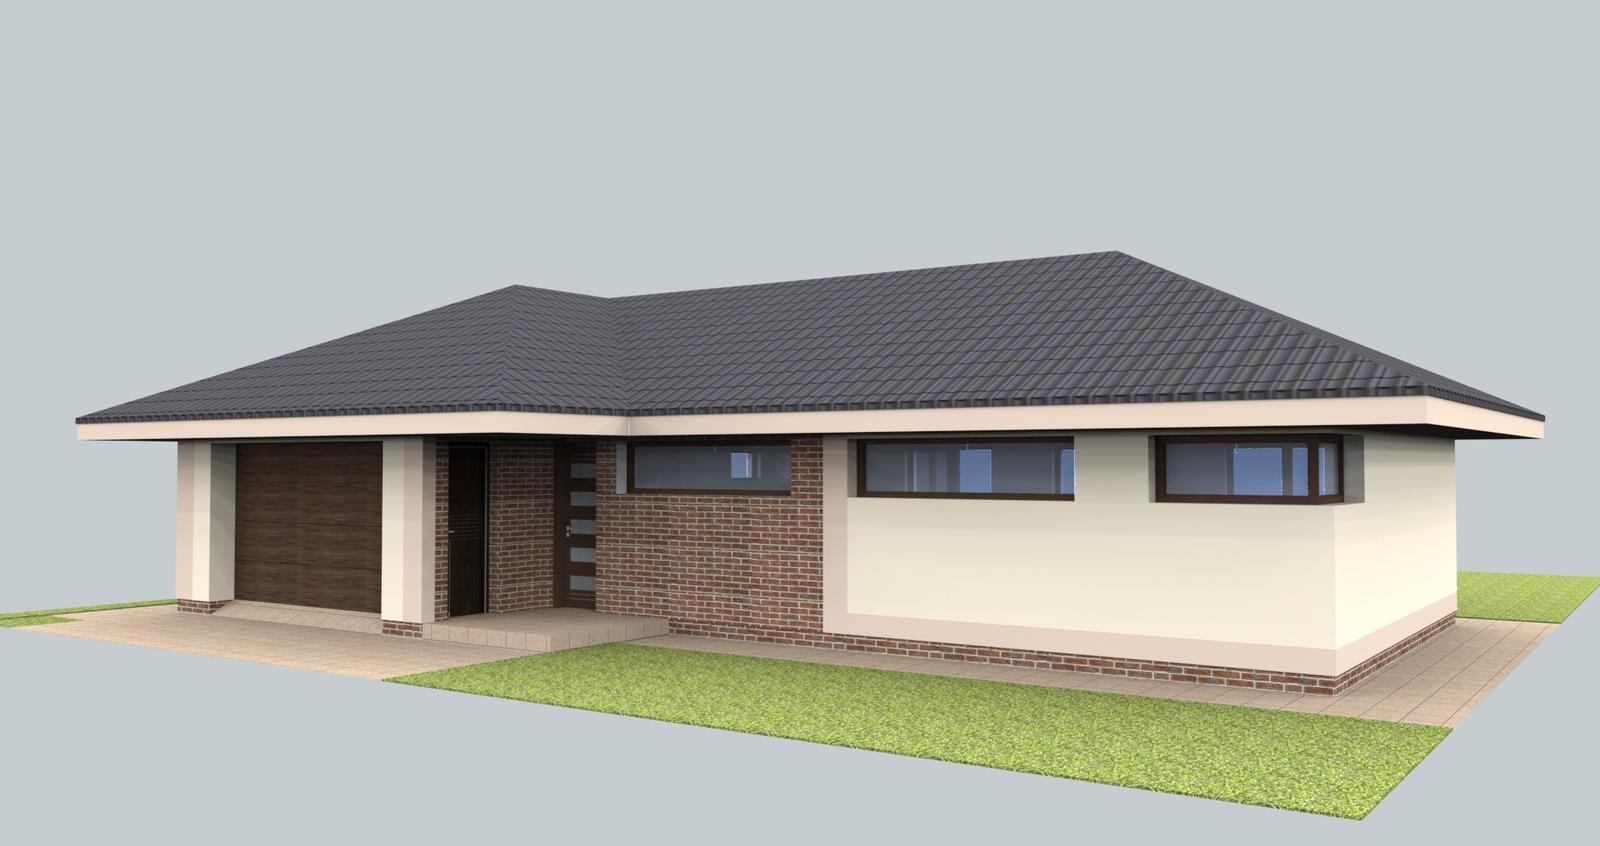 Prebiehajuce projekty - Návrh fasády bungalovu